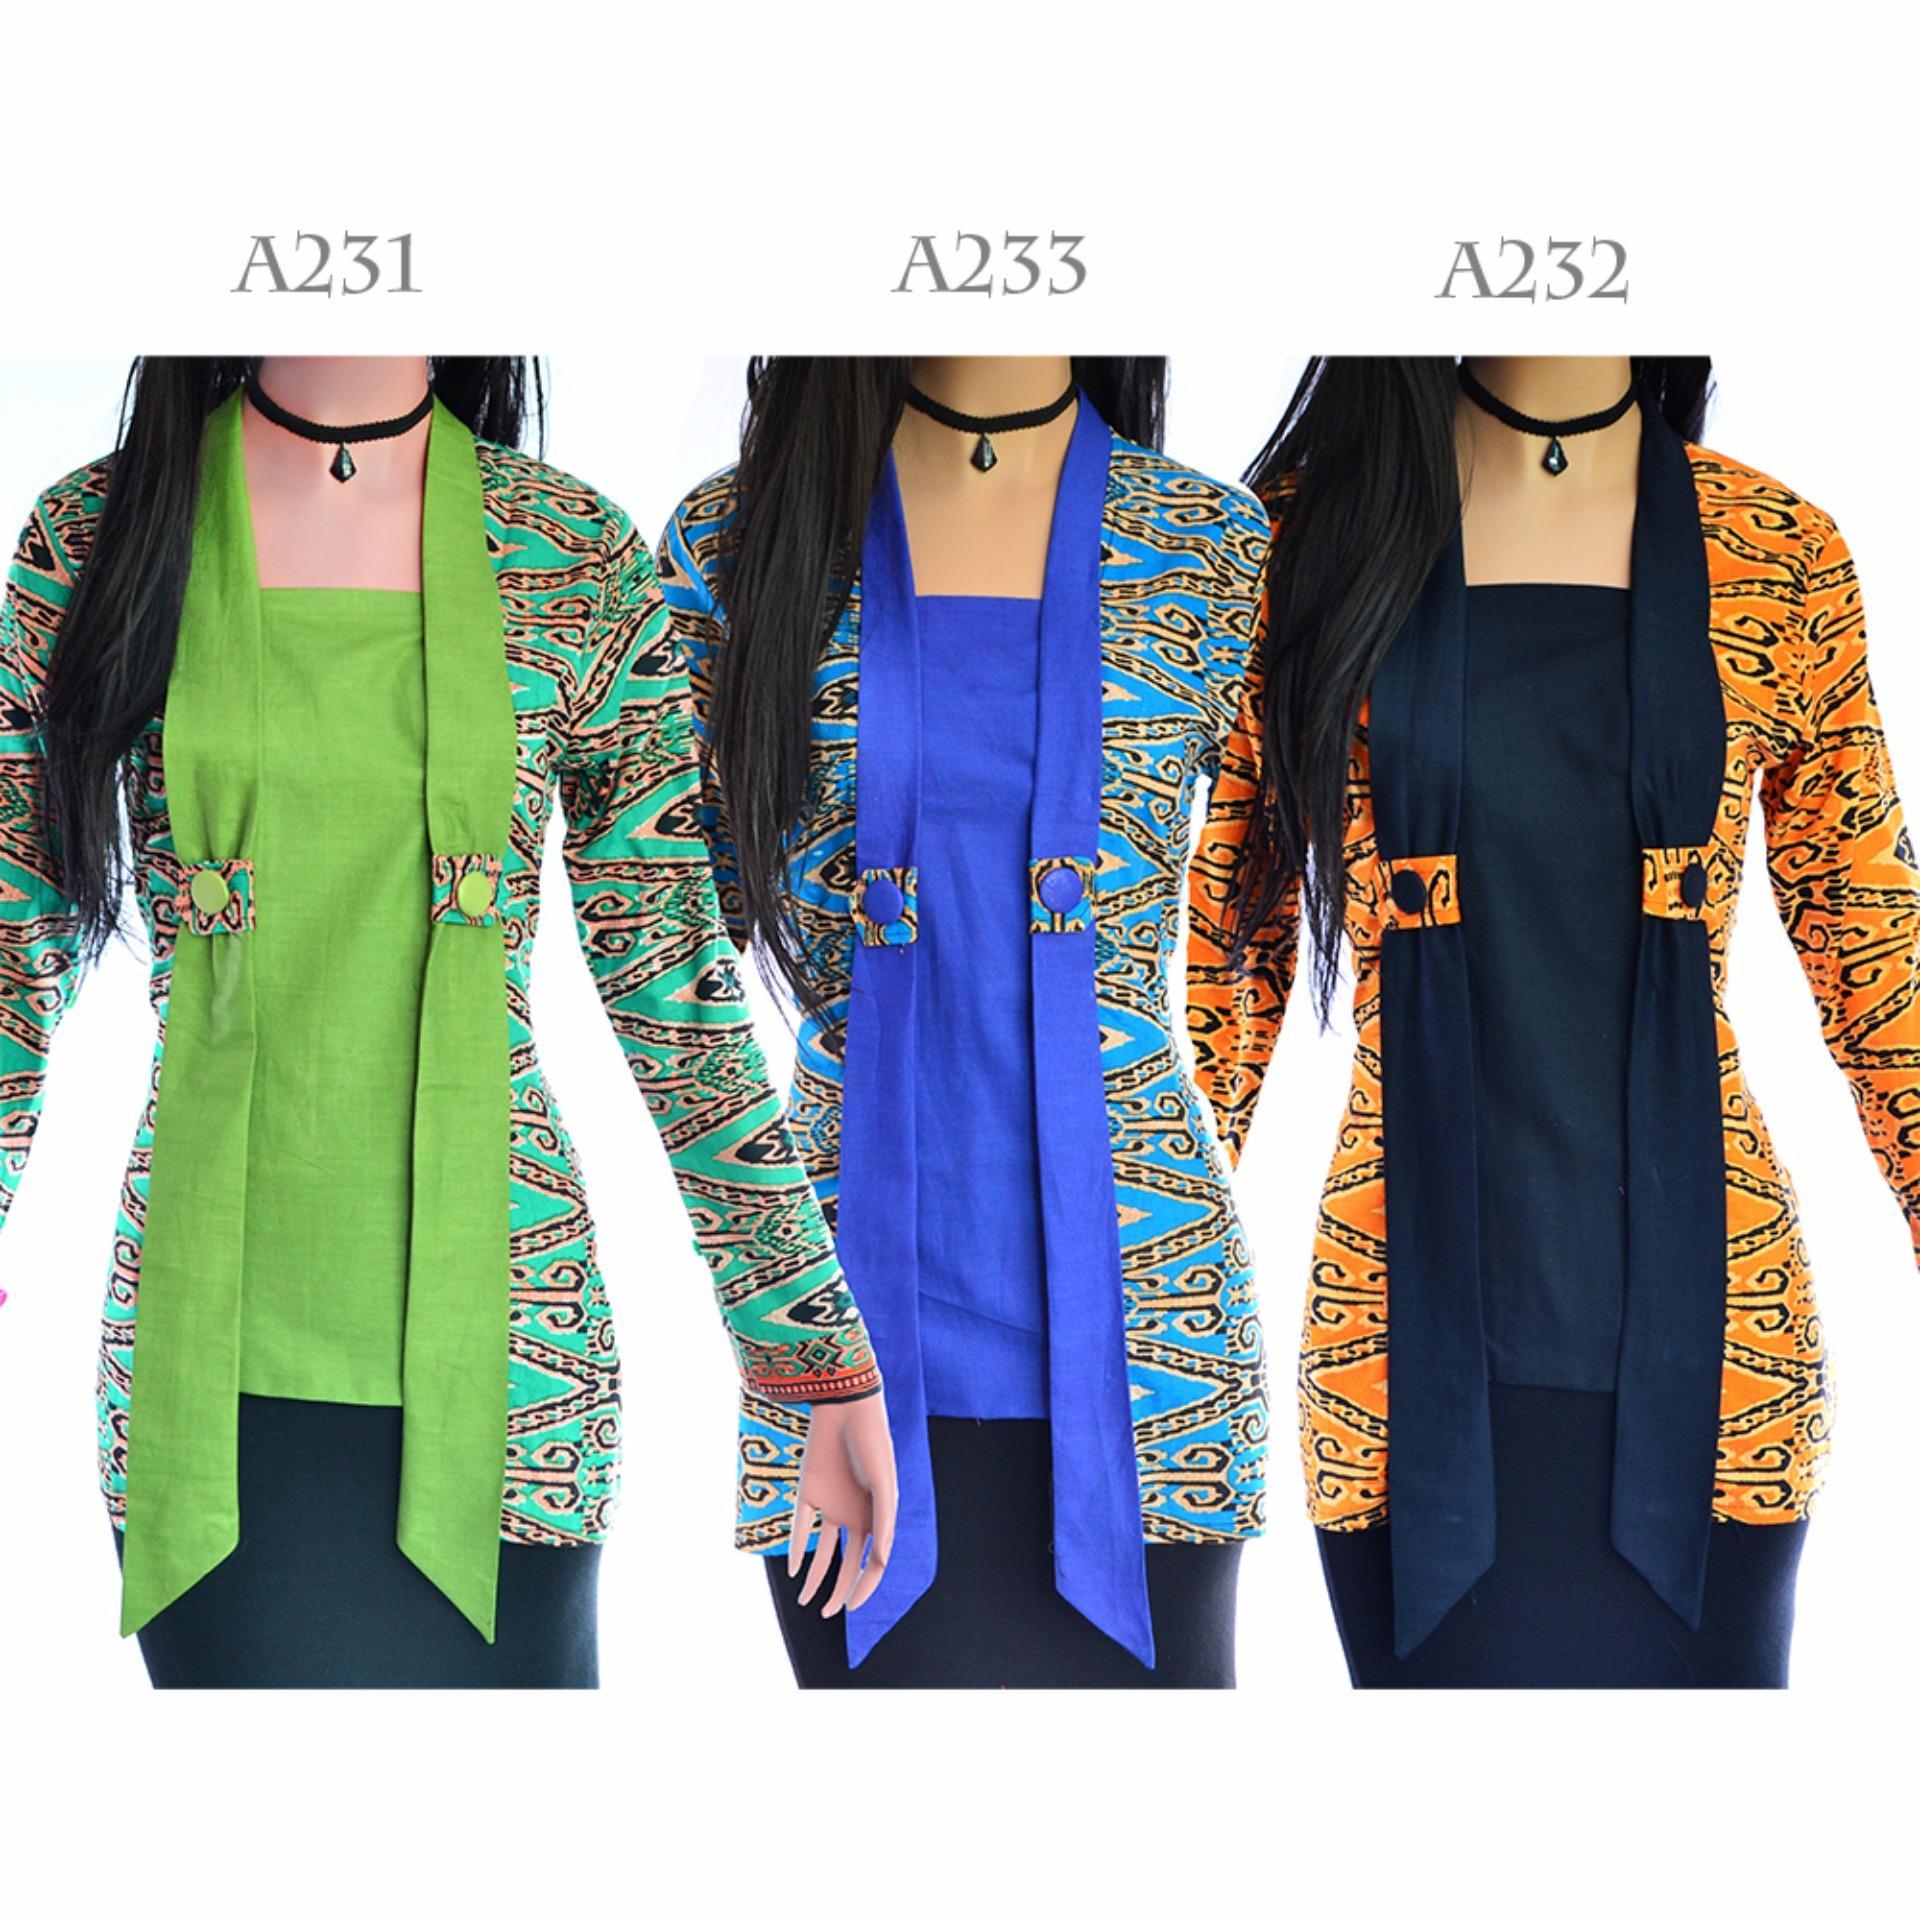 Review Dua Melati Atasan Blus Batik Wanita Tunik Kutu Baru Katun La231 Terbaru